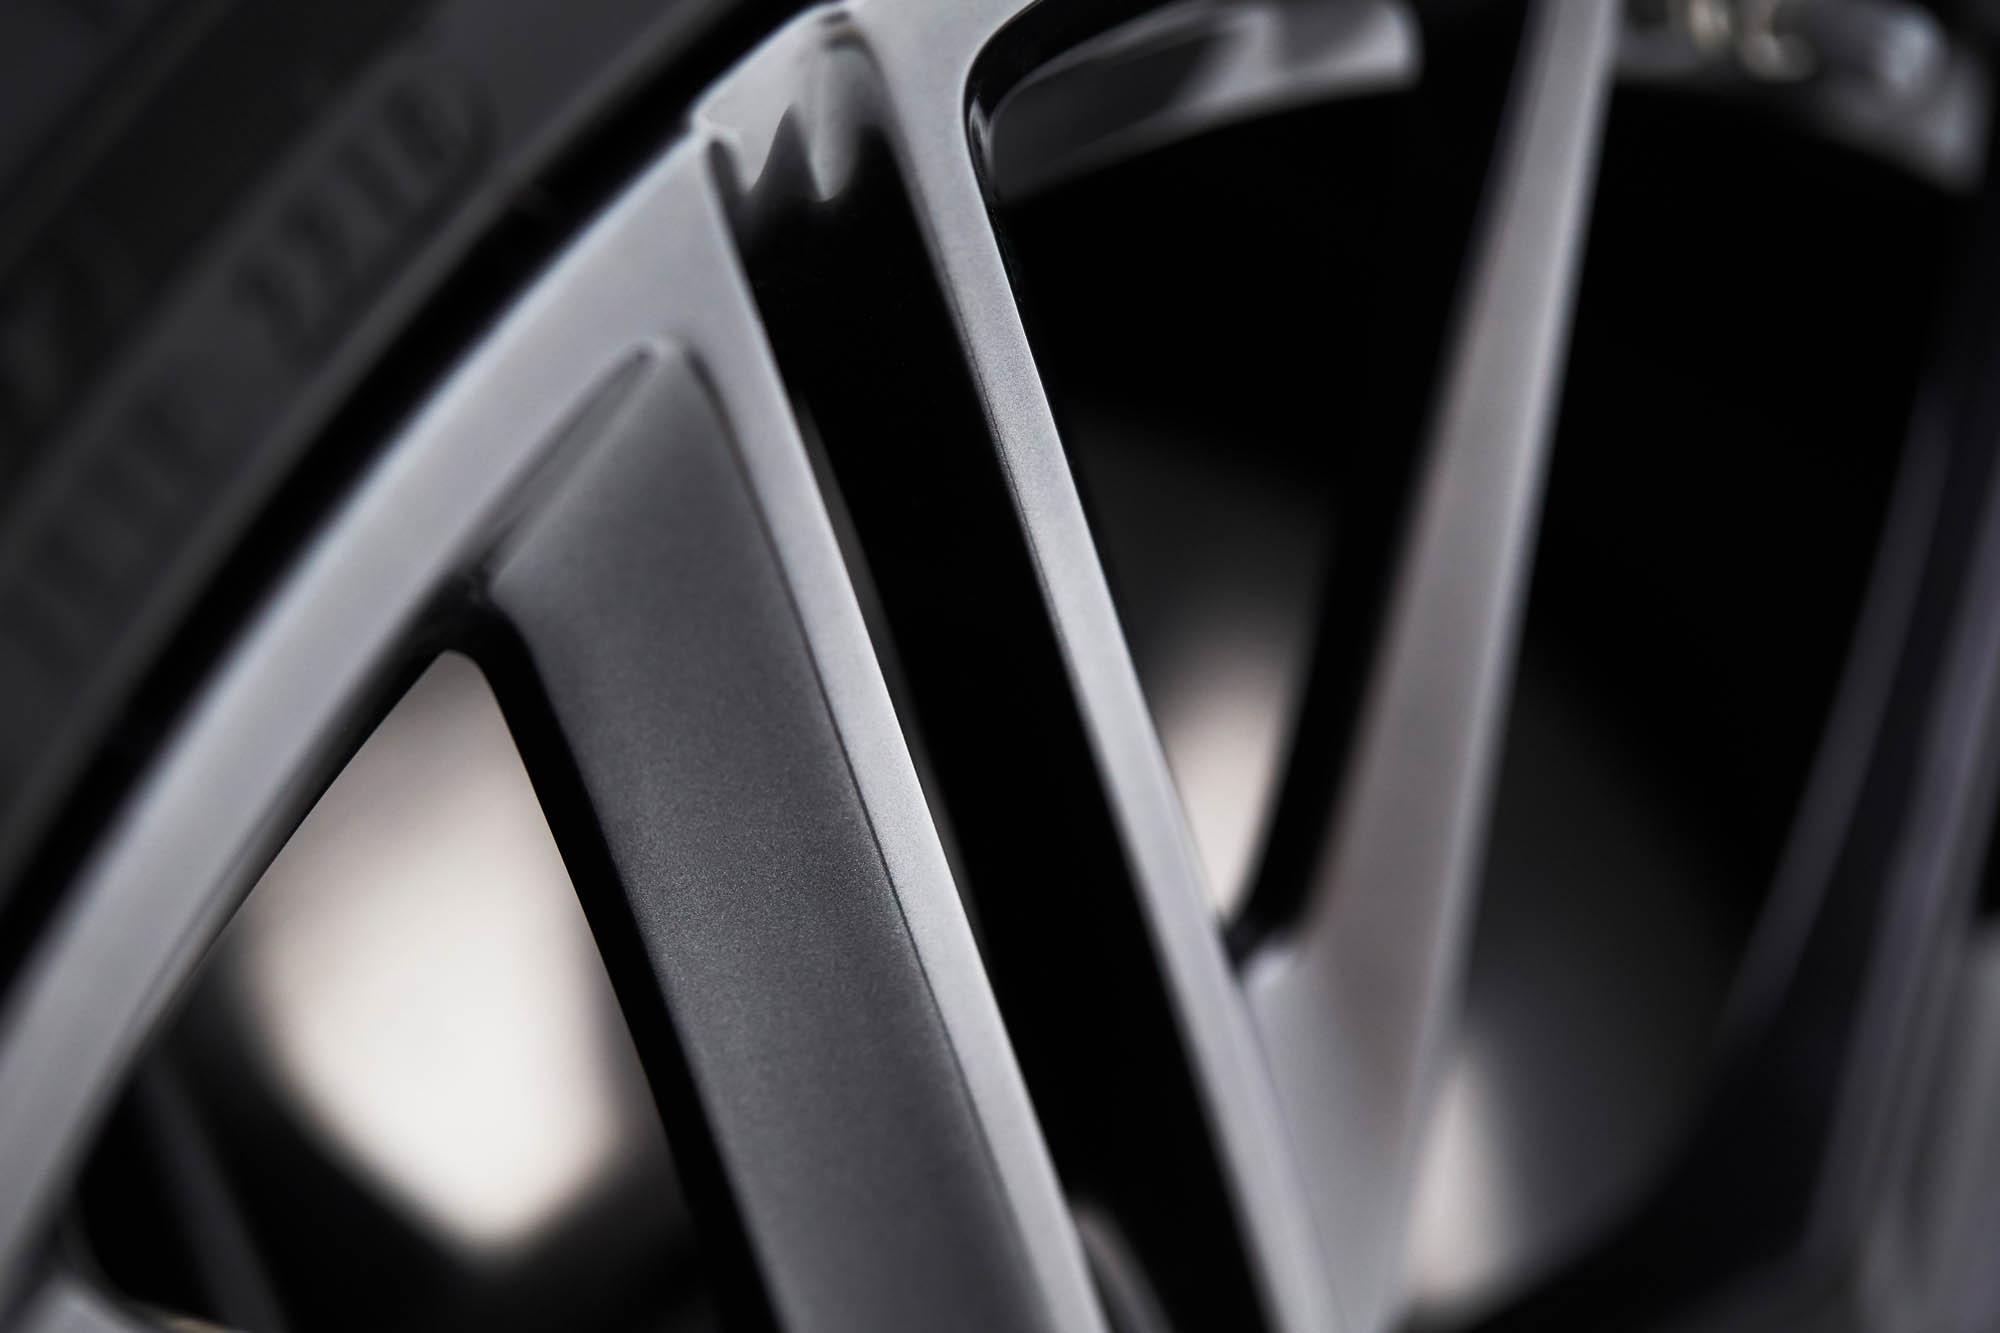 HSV Camaro ZL1 Motoring Automotive Photography Lucas Wroe Melbourne Photographer Videographer